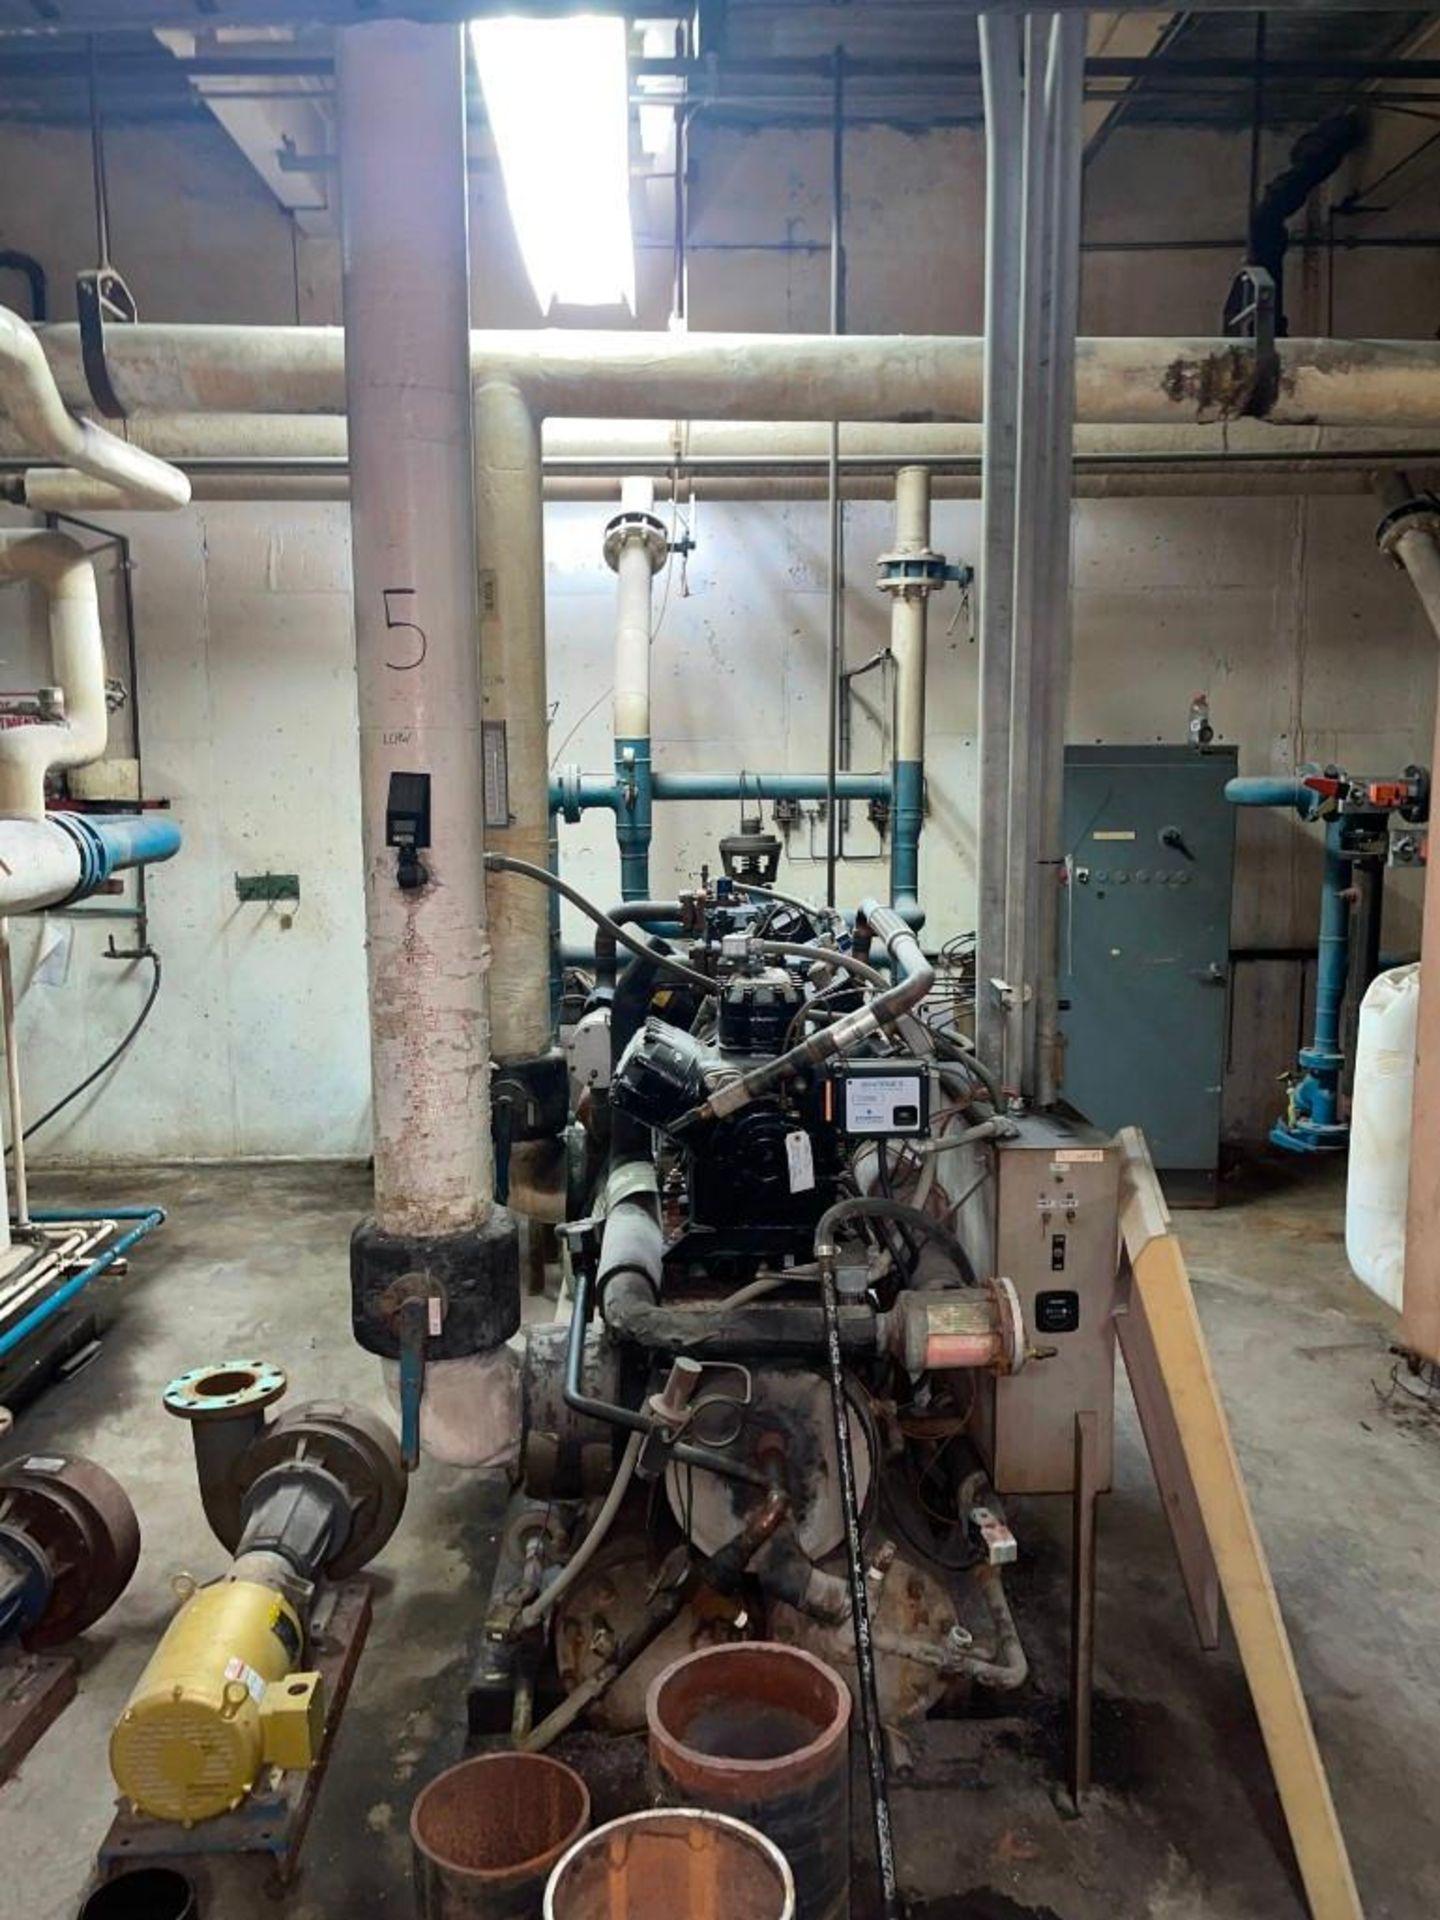 Copeland Copelametic Compressor for Chiller System - Image 4 of 12